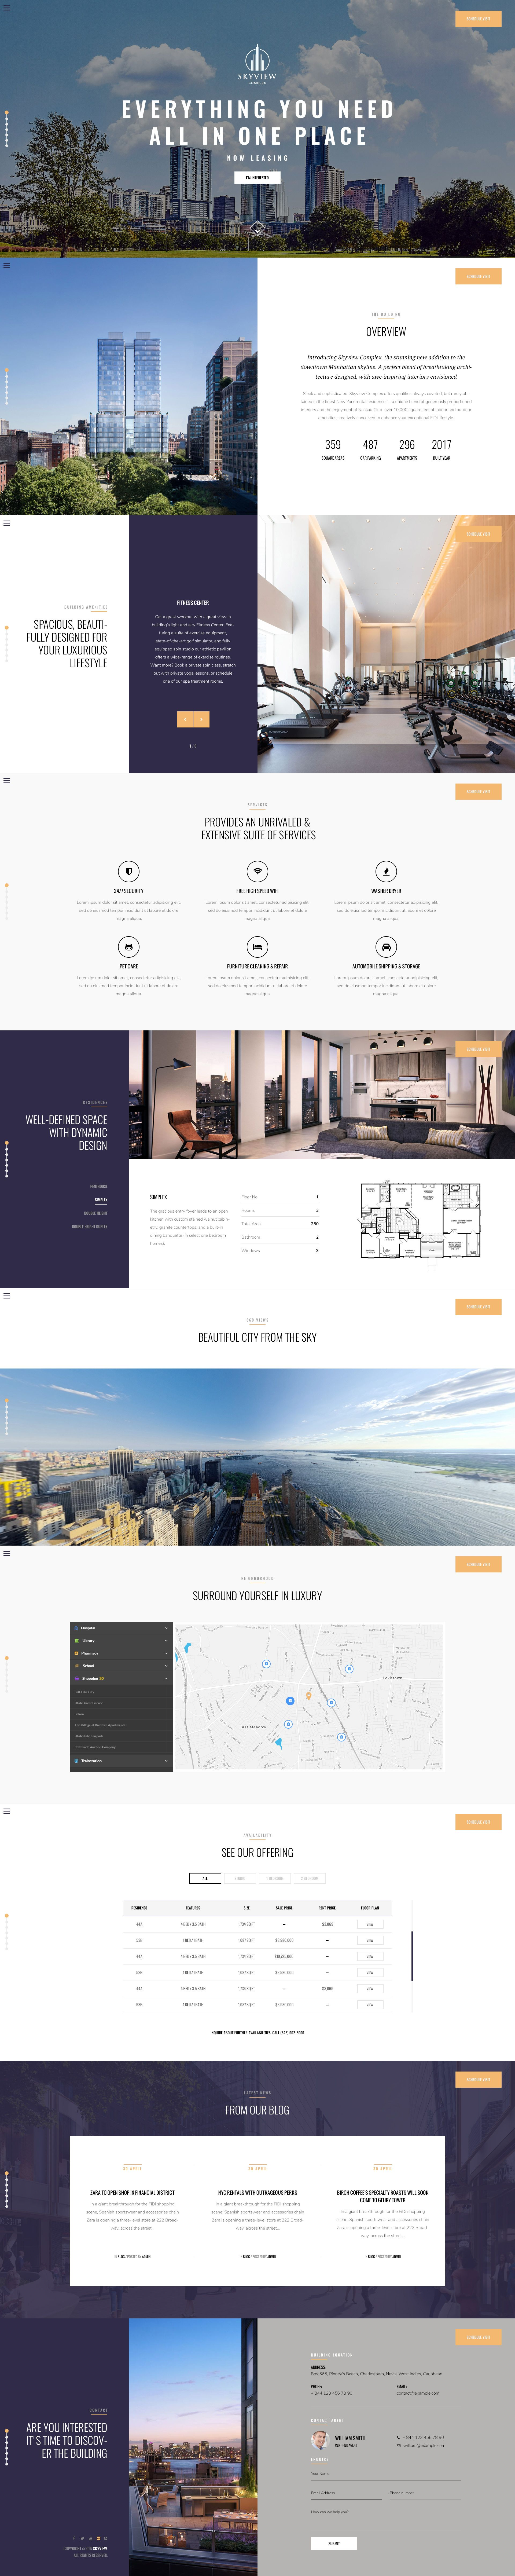 Skyview Complex One Page Single Property Wordpress Theme In 2020 Wordpress Website Design Wordpress Theme Wordpress Design